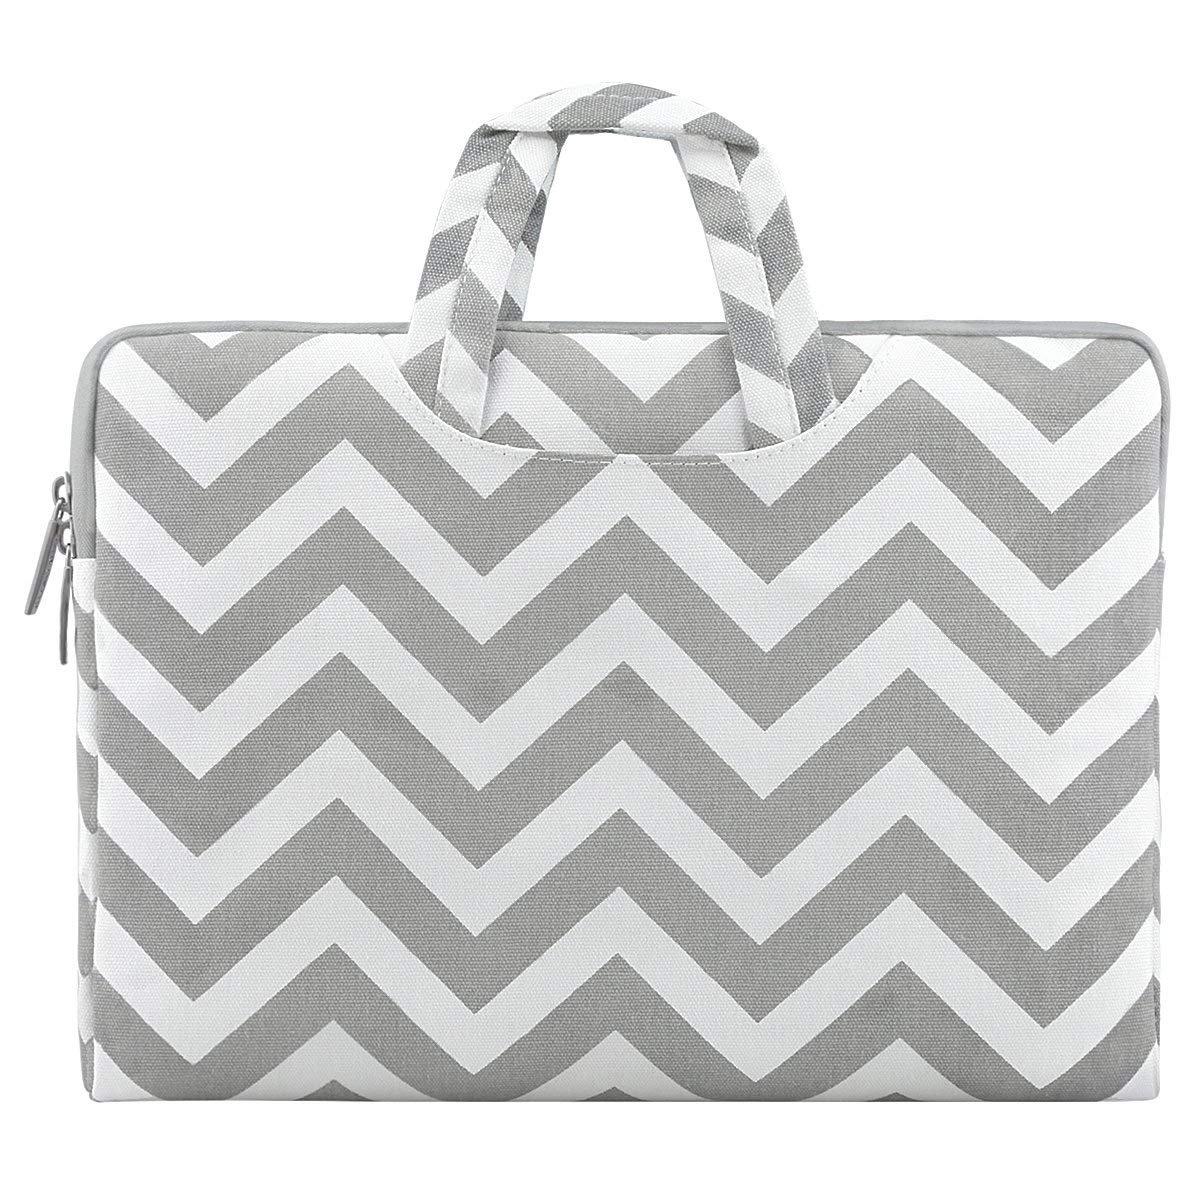 MOSISO Laptop Briefcase Handbag Compatible 13-13.3 Inch MacBook Pro, MacBook Air, Notebook Computer, Chevron Style Canvas Fabric Carrying Sleeve Case Cover Bag, Gray